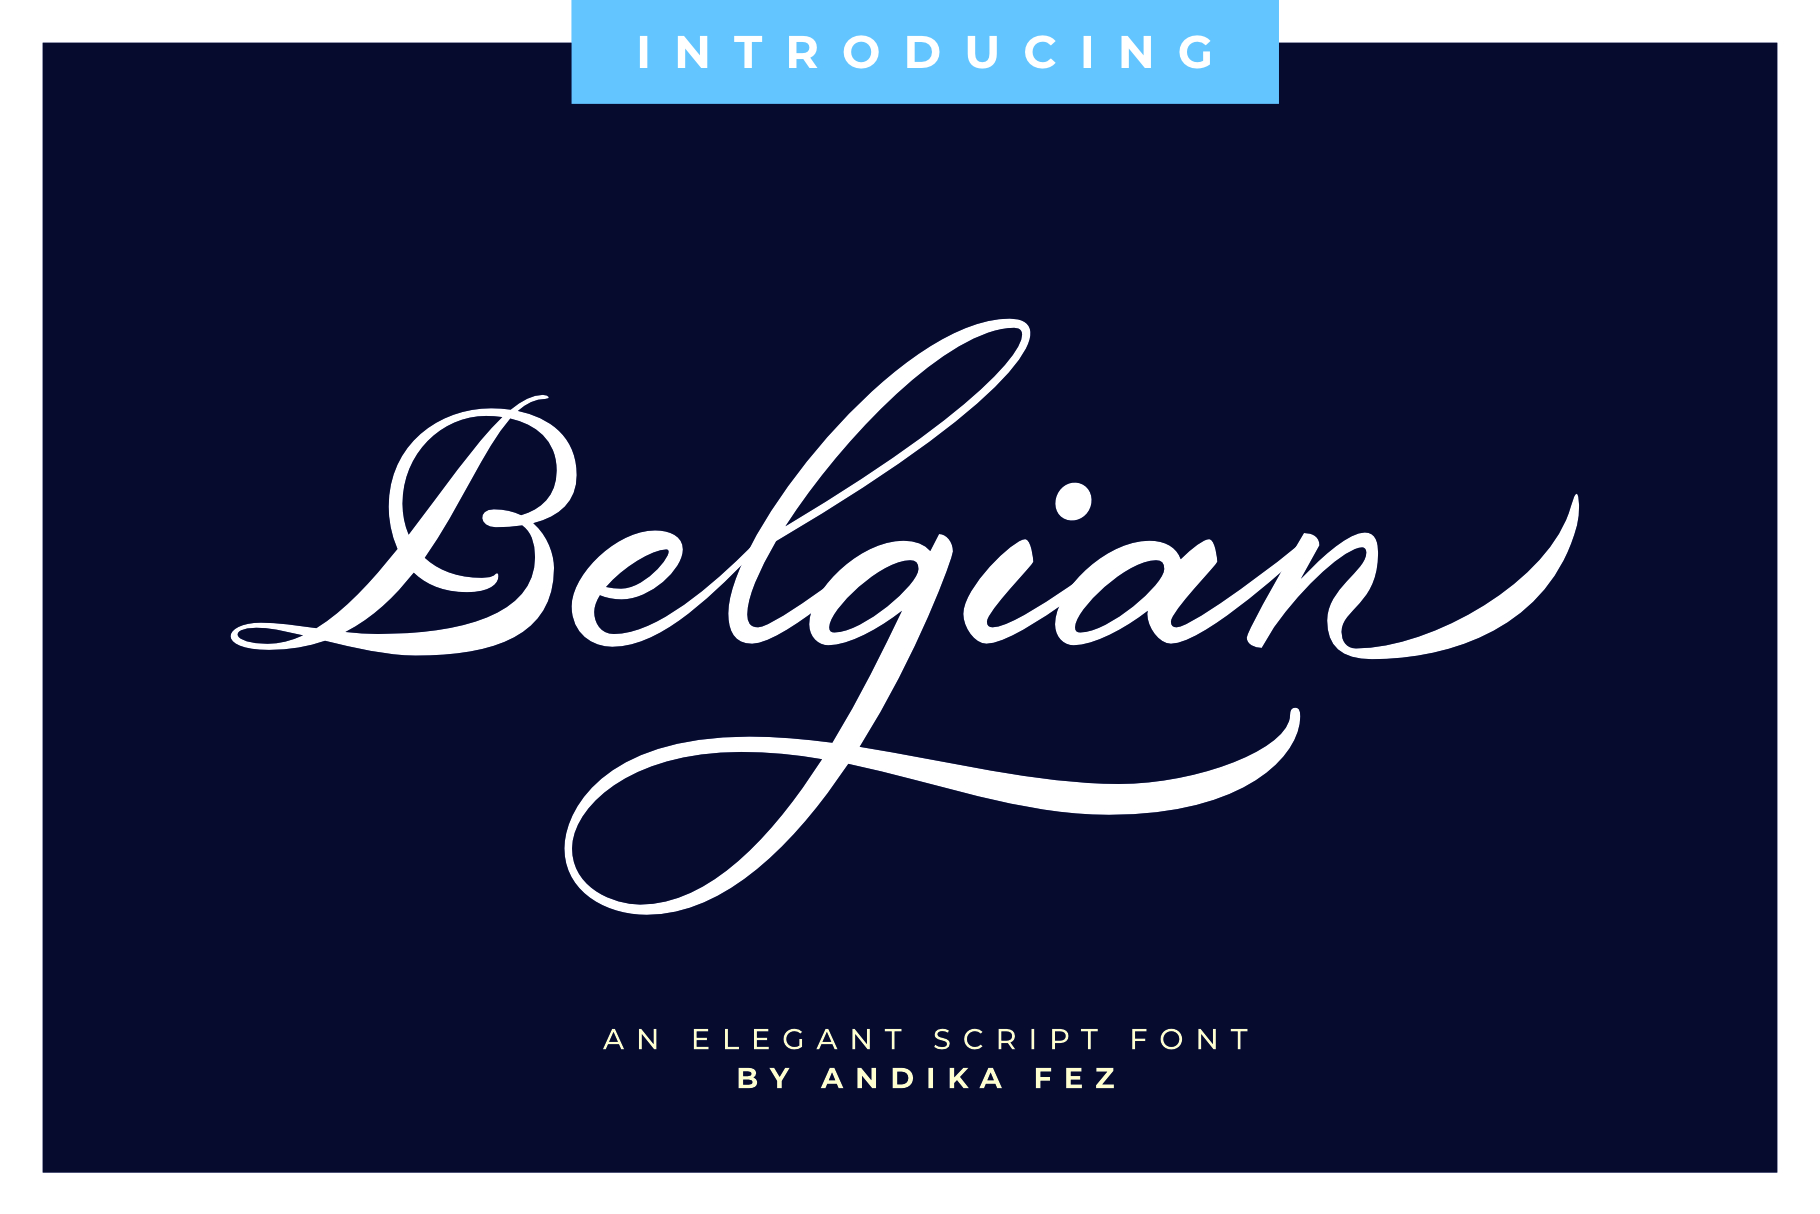 Belgian Signature example image 1